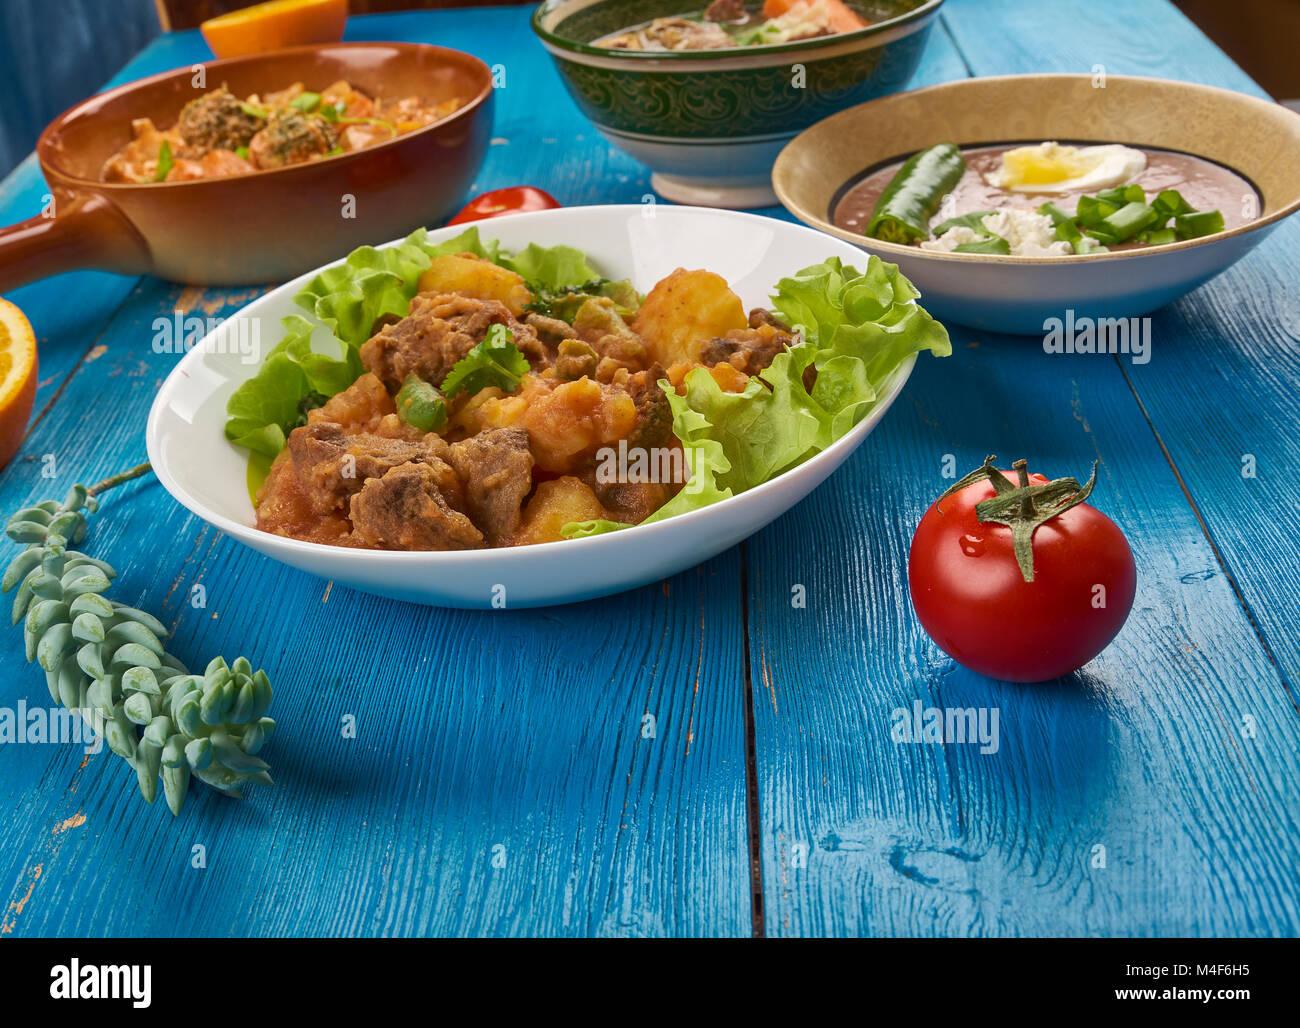 Djibouti Food Stock Photos & Djibouti Food Stock Images - Alamy